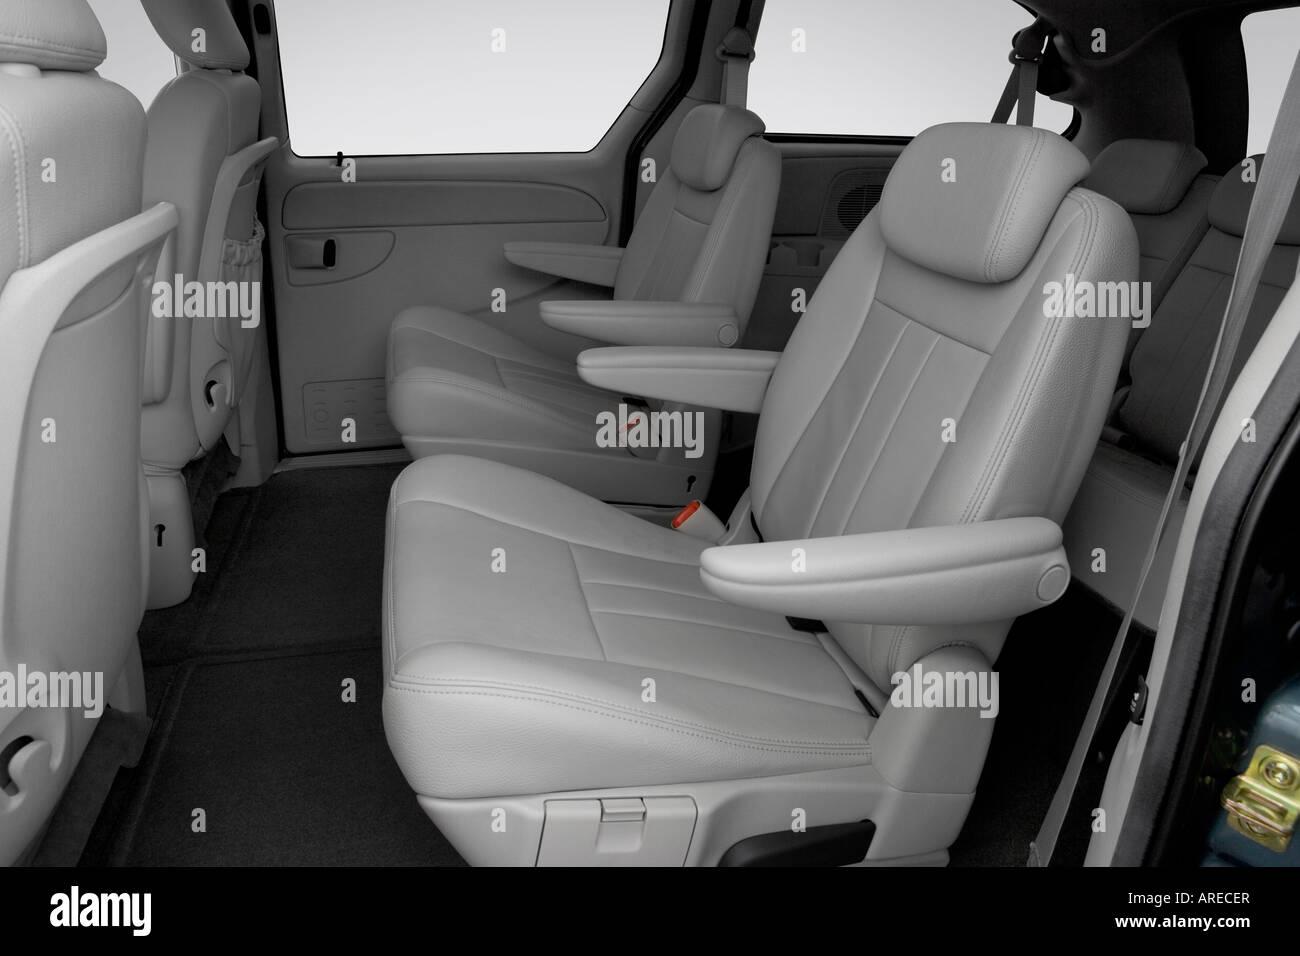 Phenomenal 2006 Dodge Grand Caravan Sxt In Blue Rear Seats Stock Pabps2019 Chair Design Images Pabps2019Com